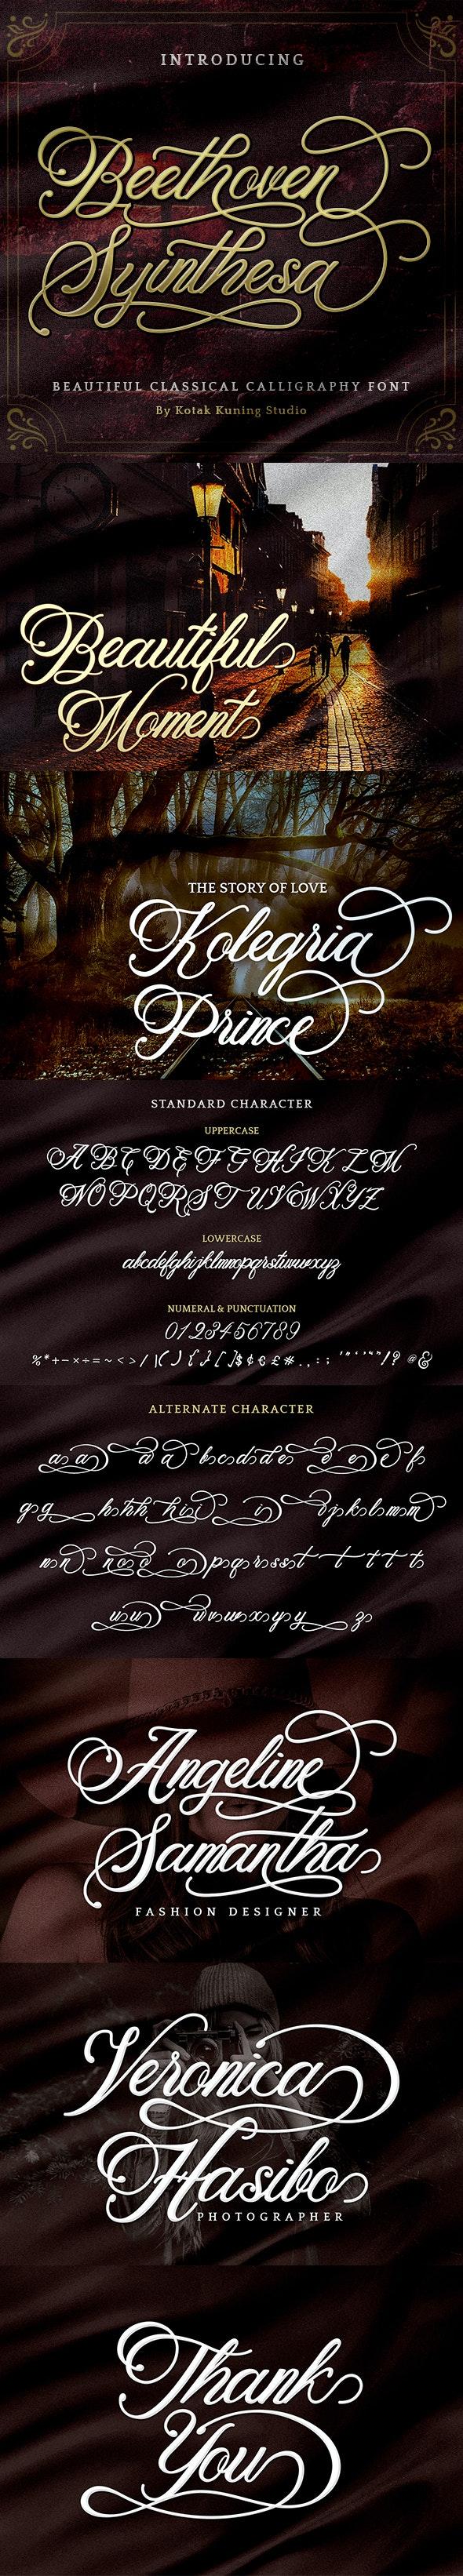 Beethoven Syinthesa - Calligraphy Script